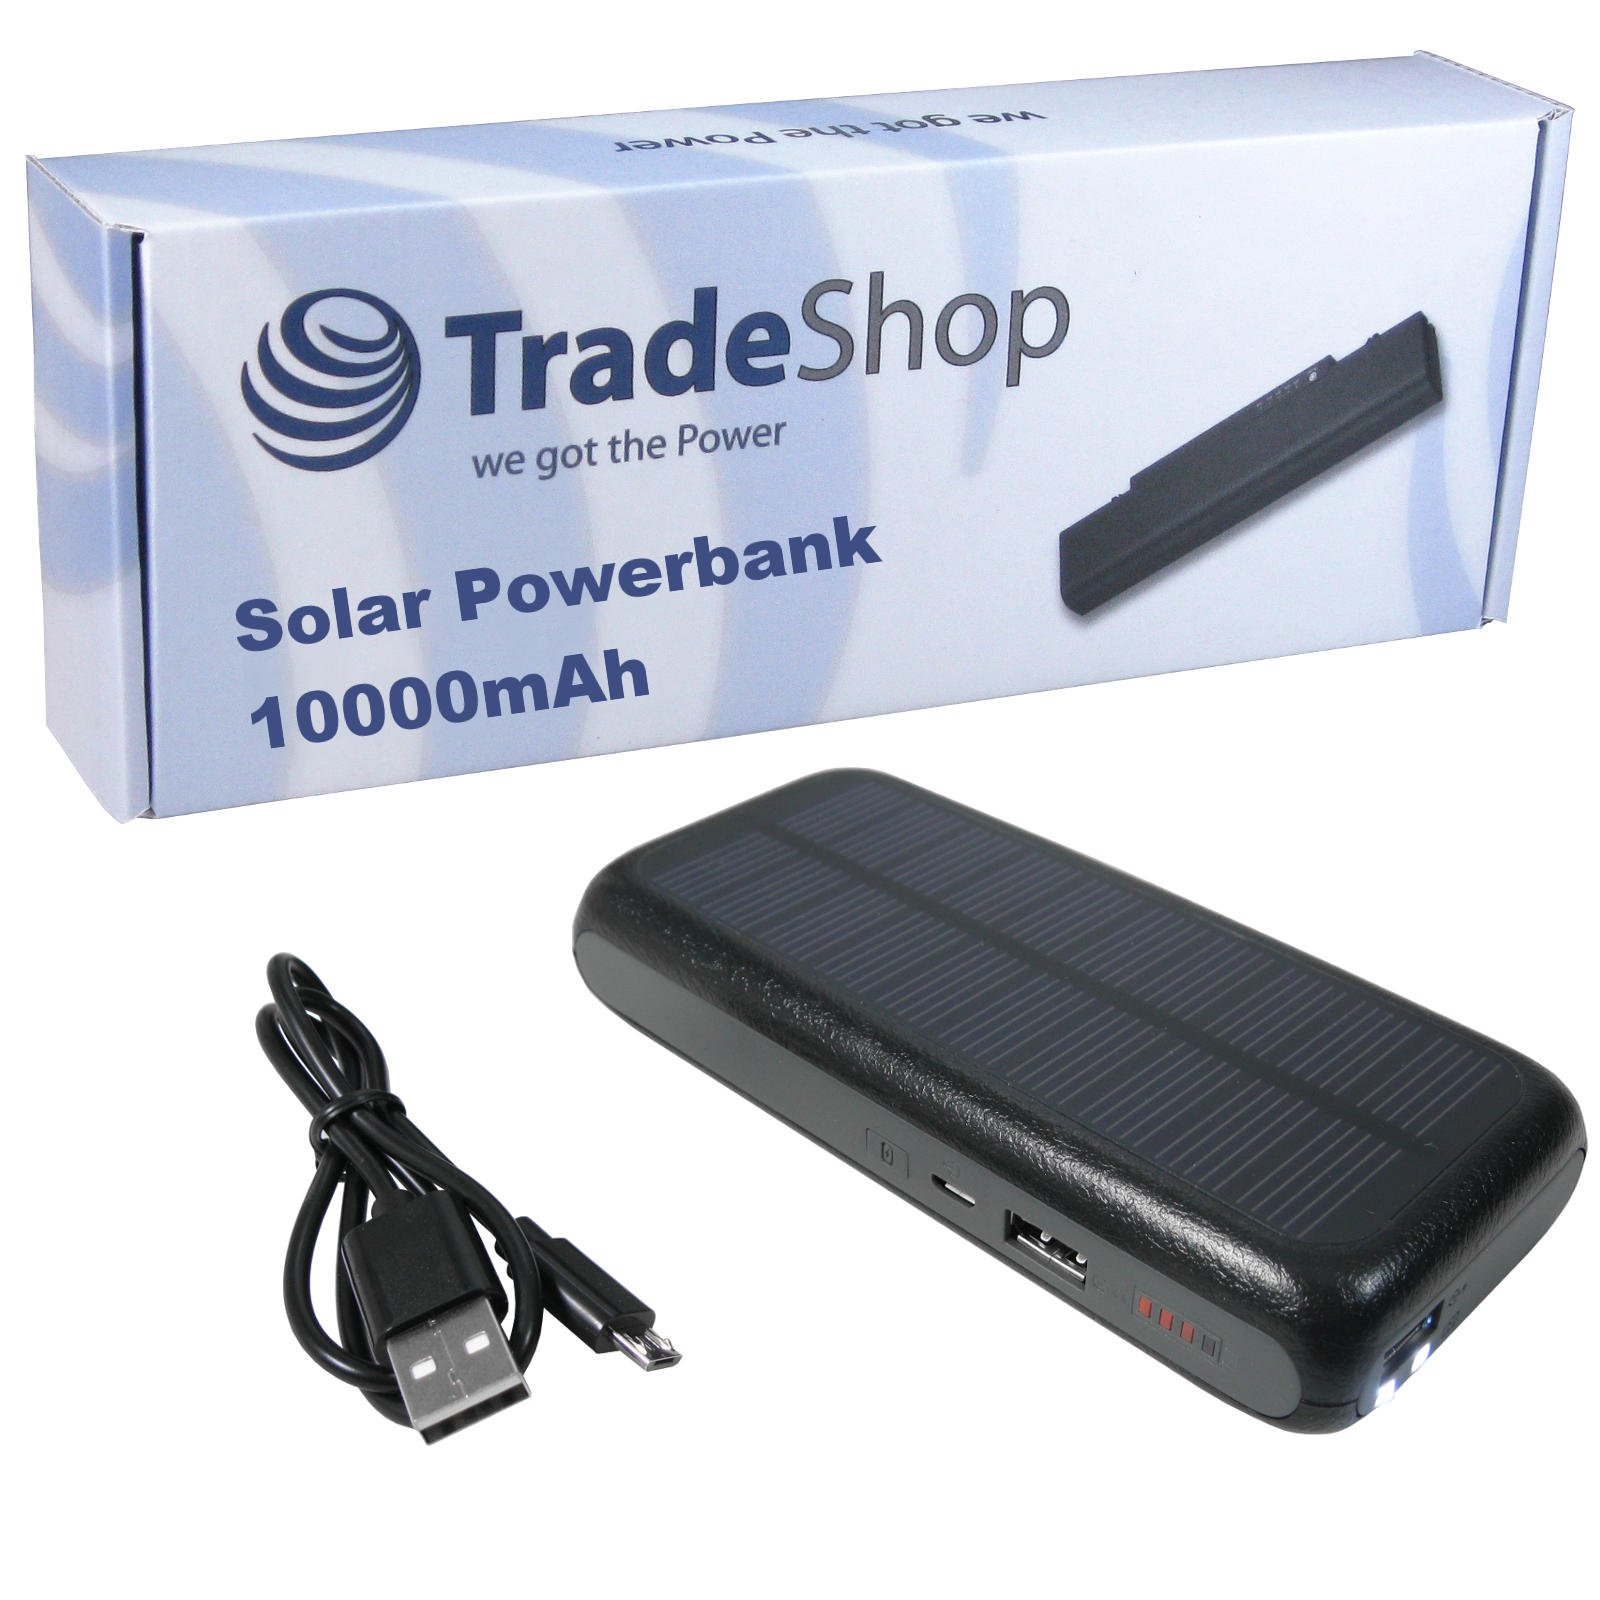 2�in1�USB Caricatore solare con batteria integrata Power Bank, 10000�mAh per APPLE IPHONE 6�6�Plus